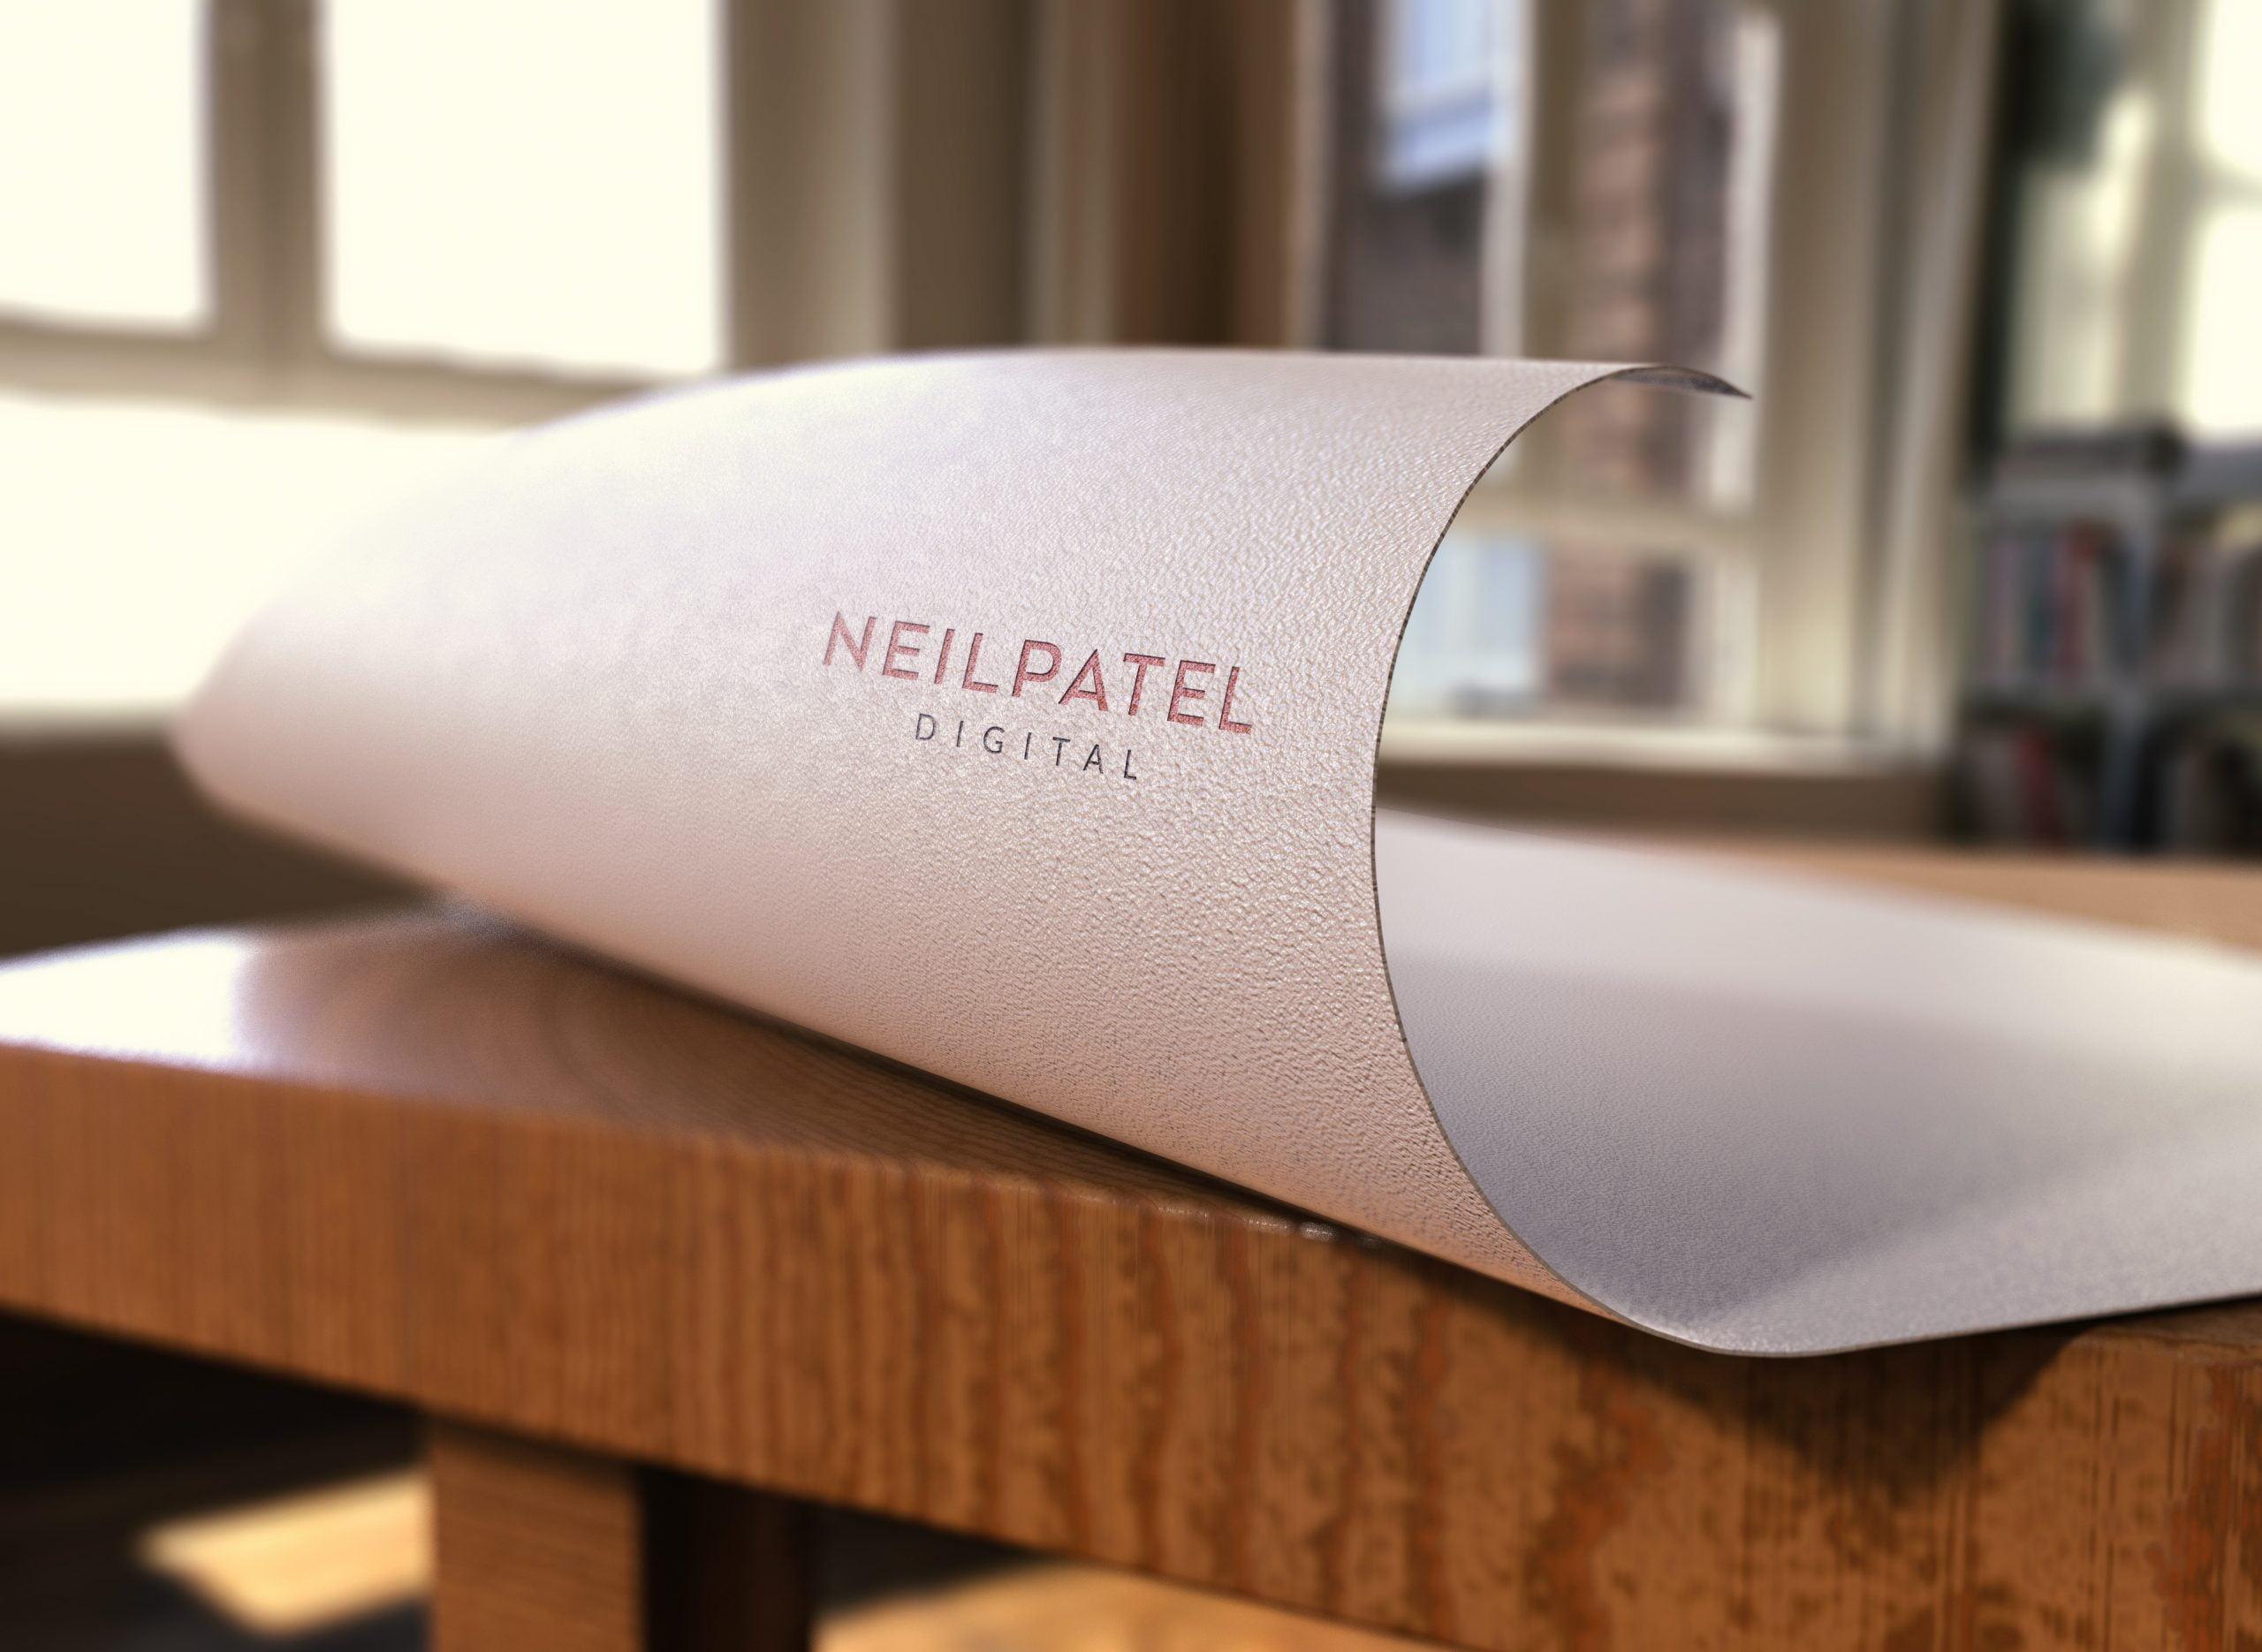 Neil-Patel-Digital-Free-Paper-Pressed-Logo-Mockup